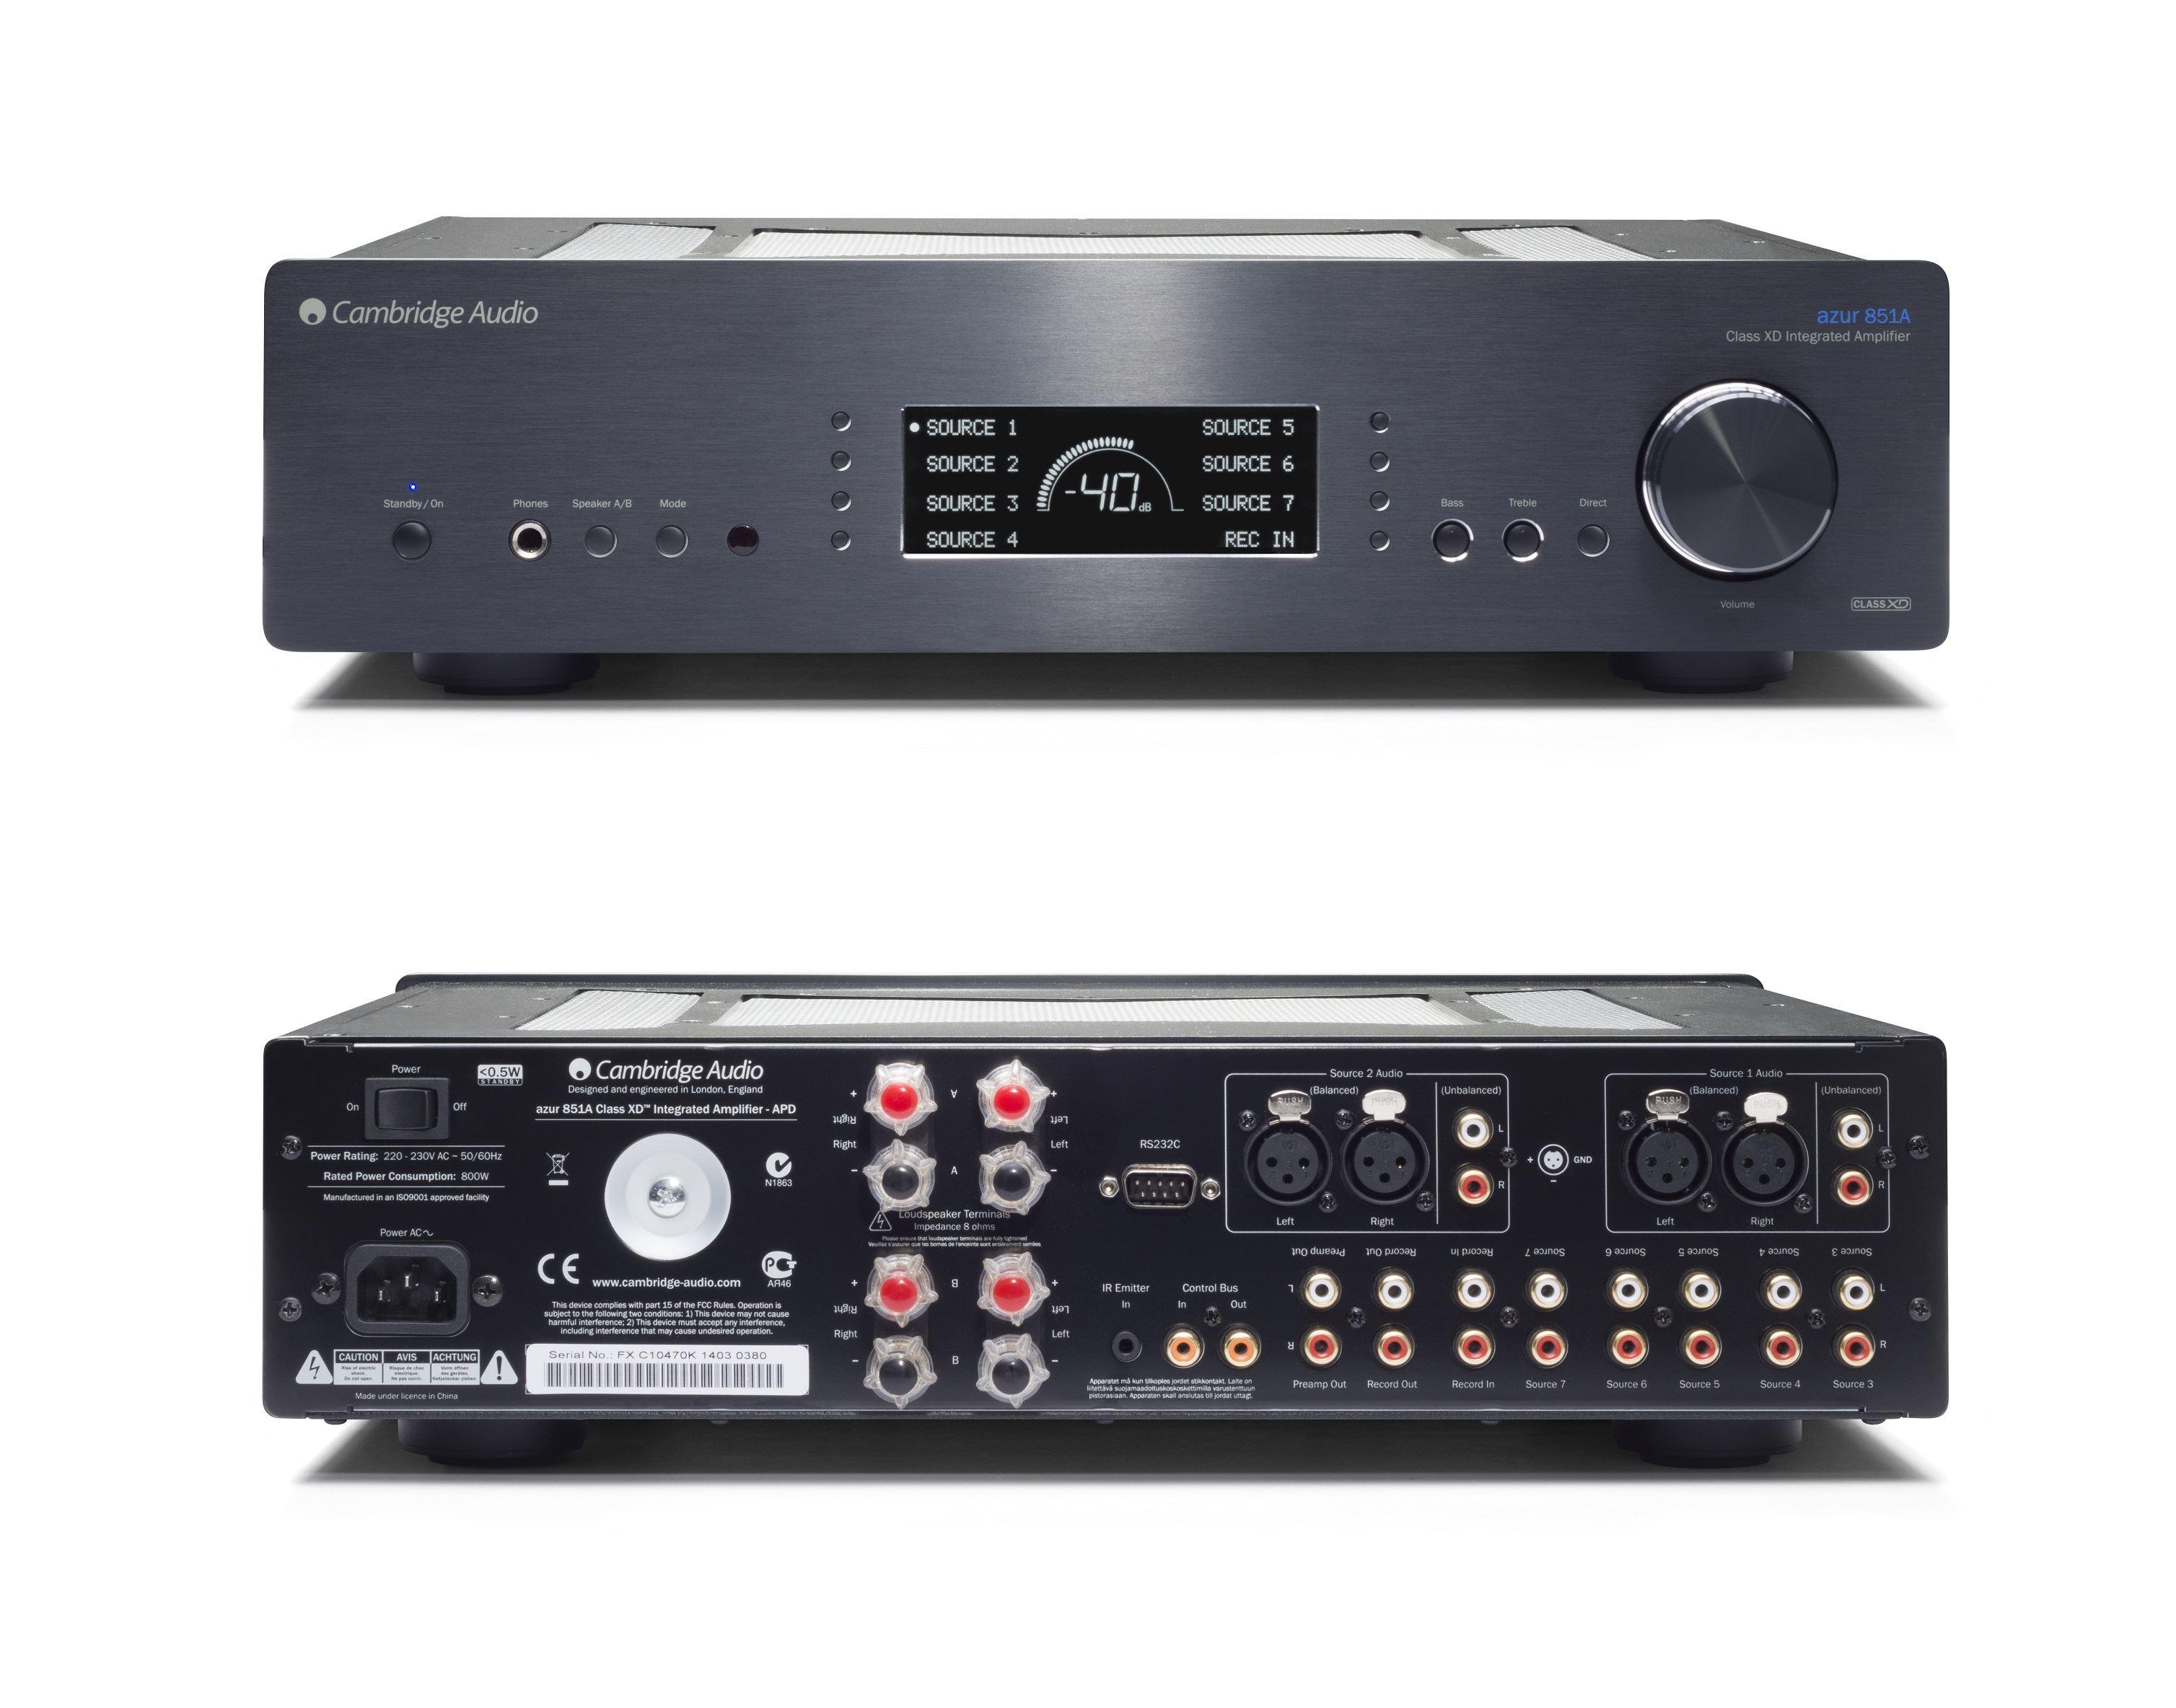 Cambridge Audio Azur 851 A